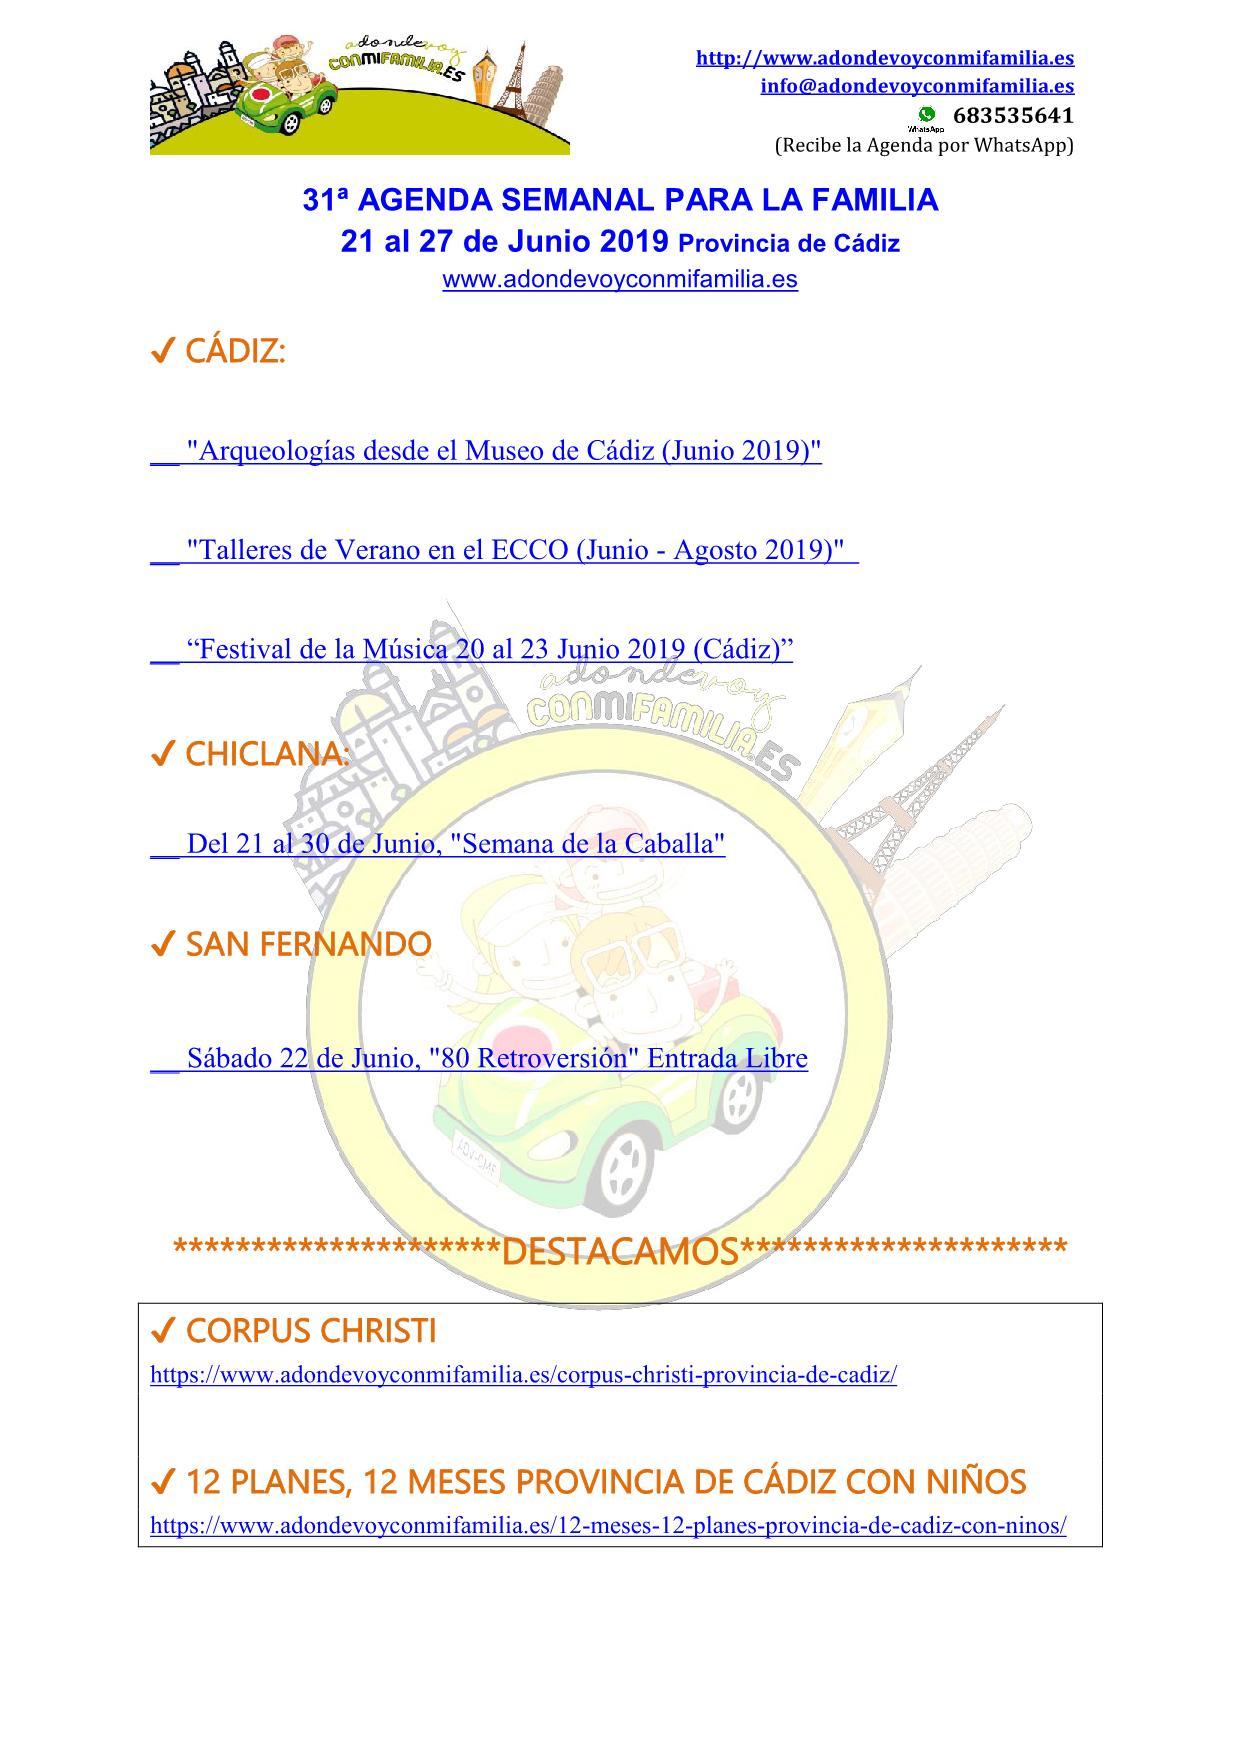 031 Agenda semanal familiar 21 al 27 Junio 2019